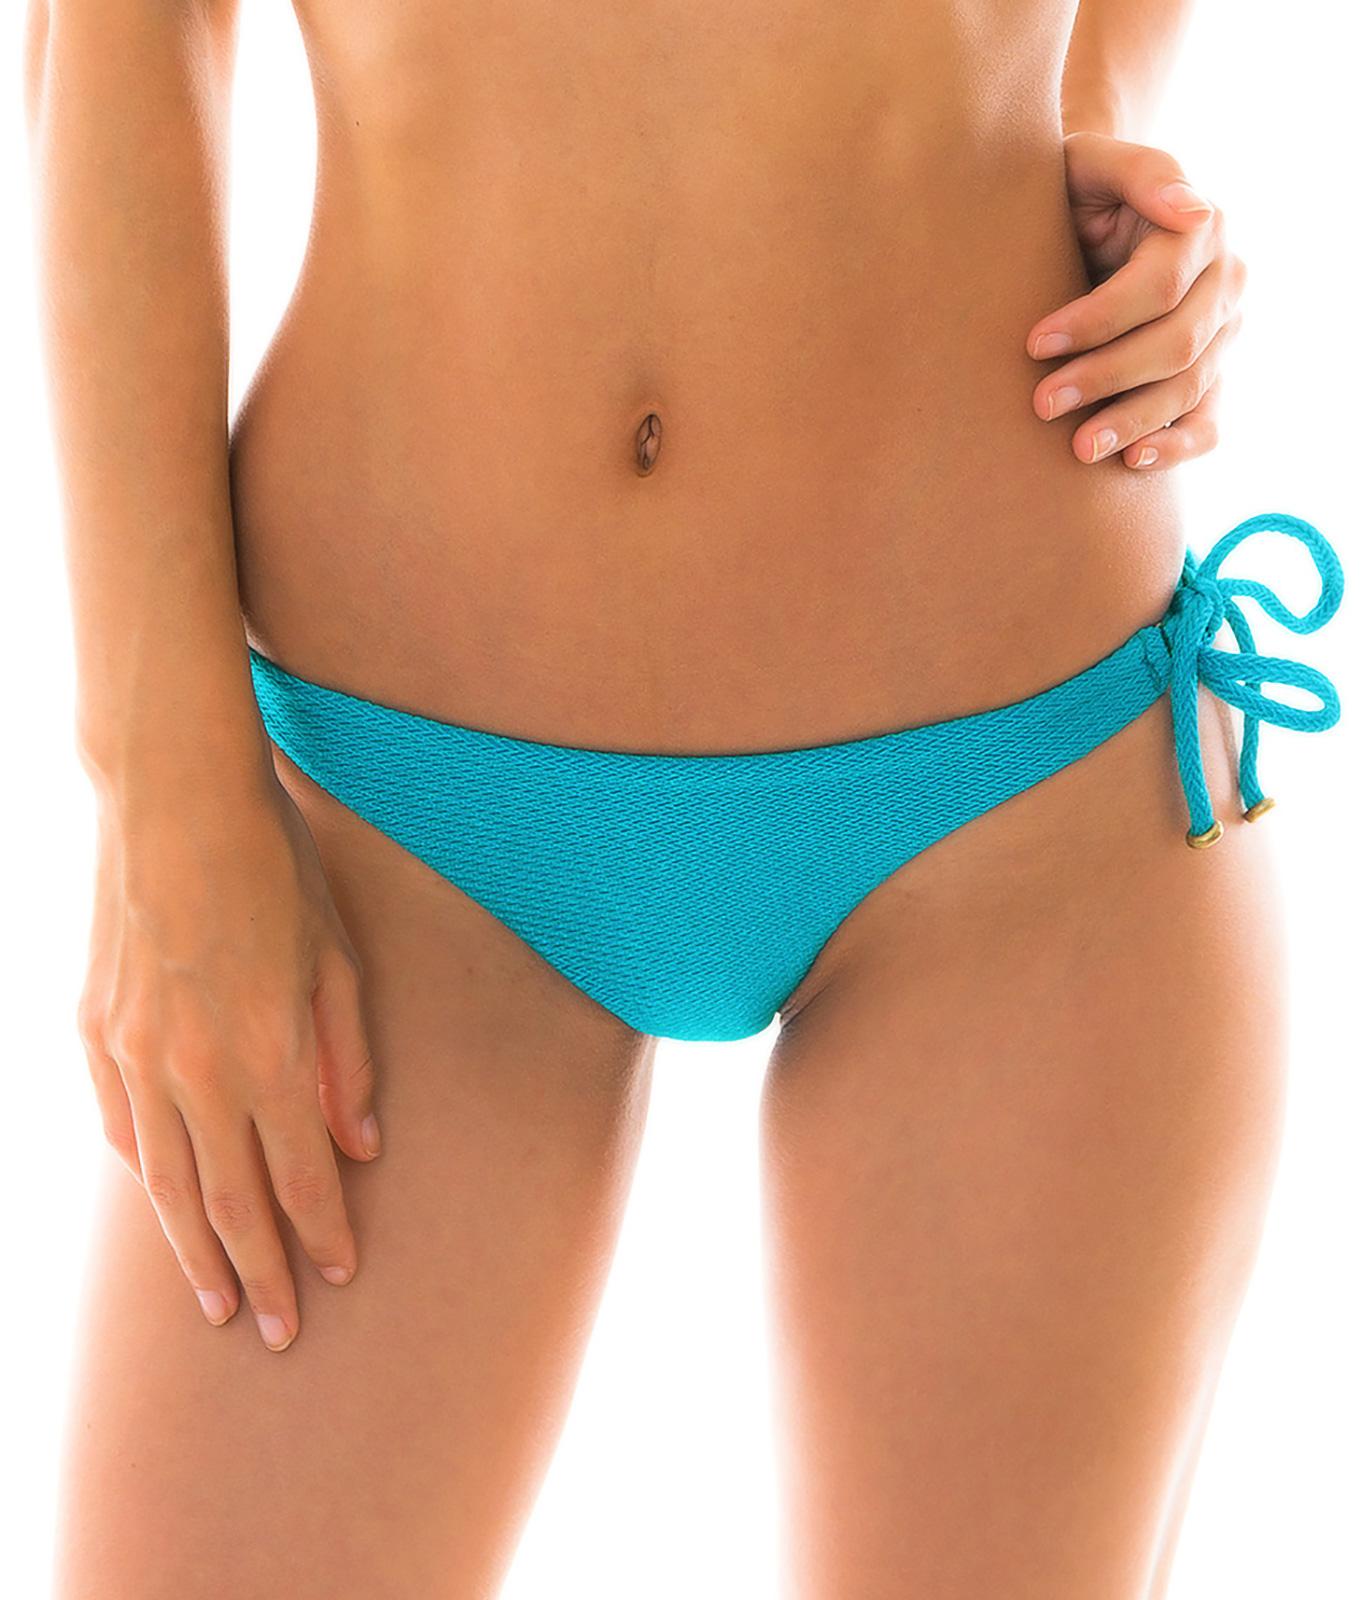 289d887670 ... Textured and accessorized blue bikini bottom - BOTTOM DUNA TRI FIORDE  ...